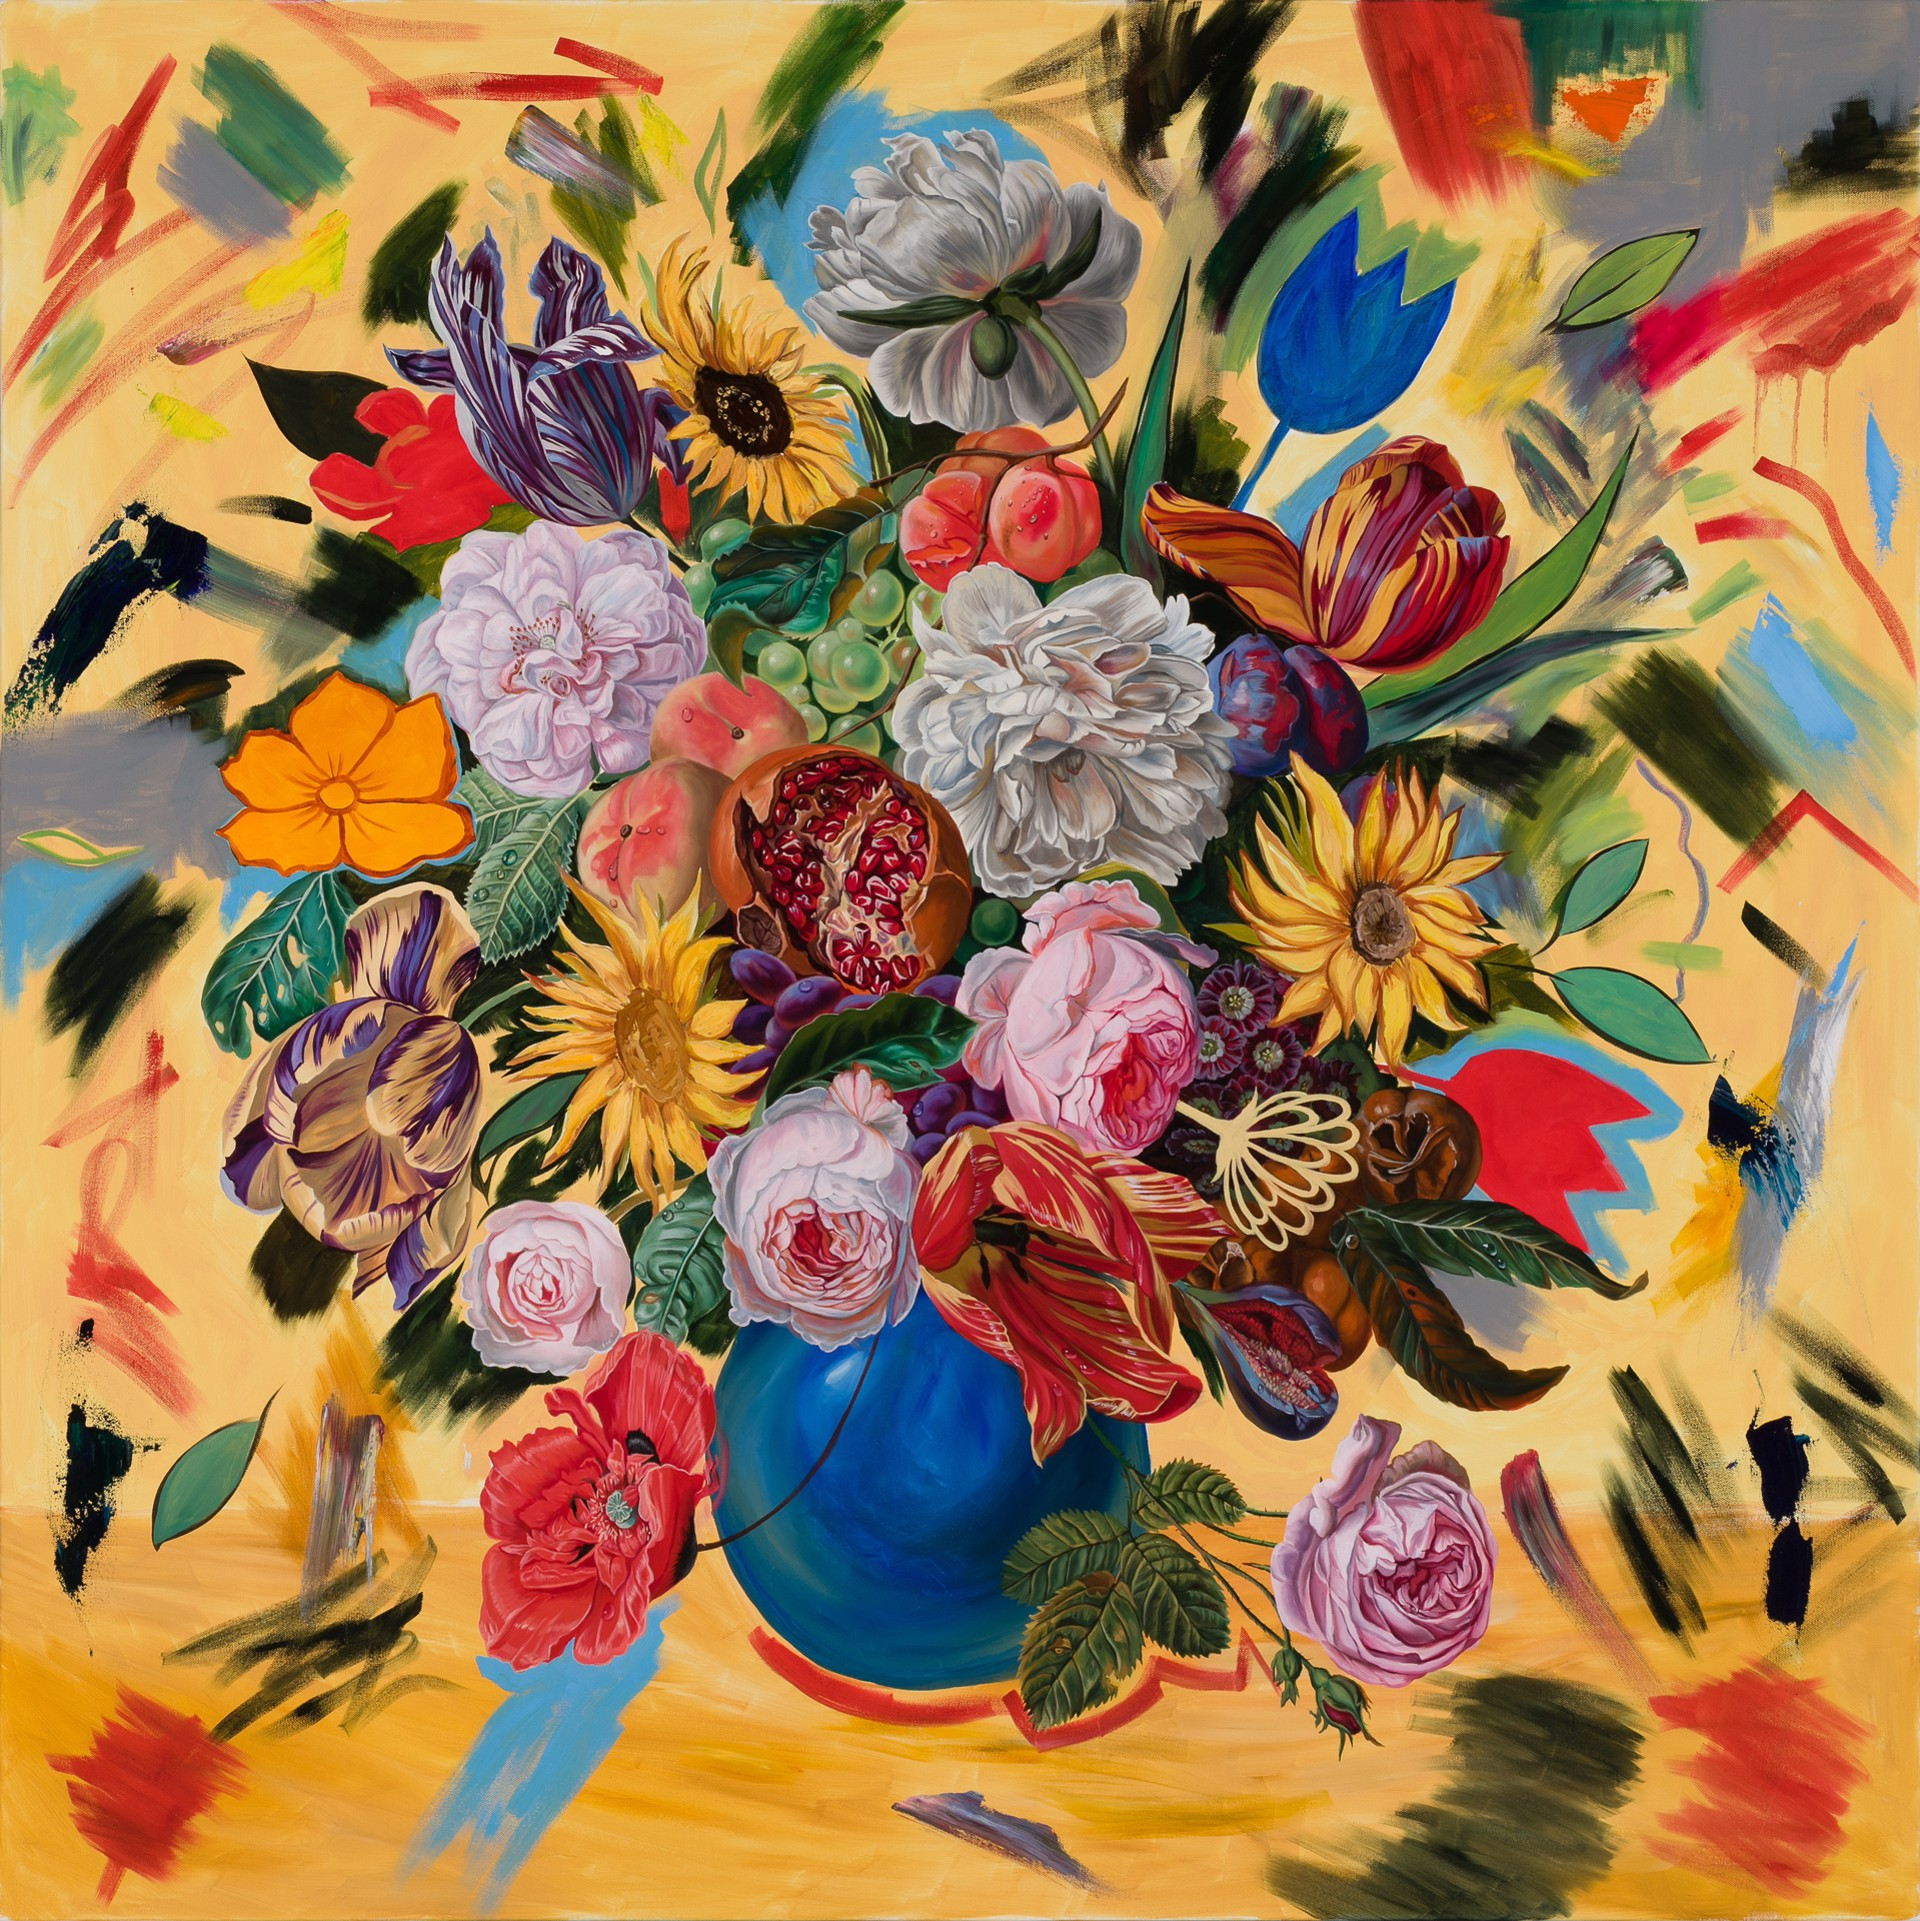 Symphony of Petals by Robin Hextrum